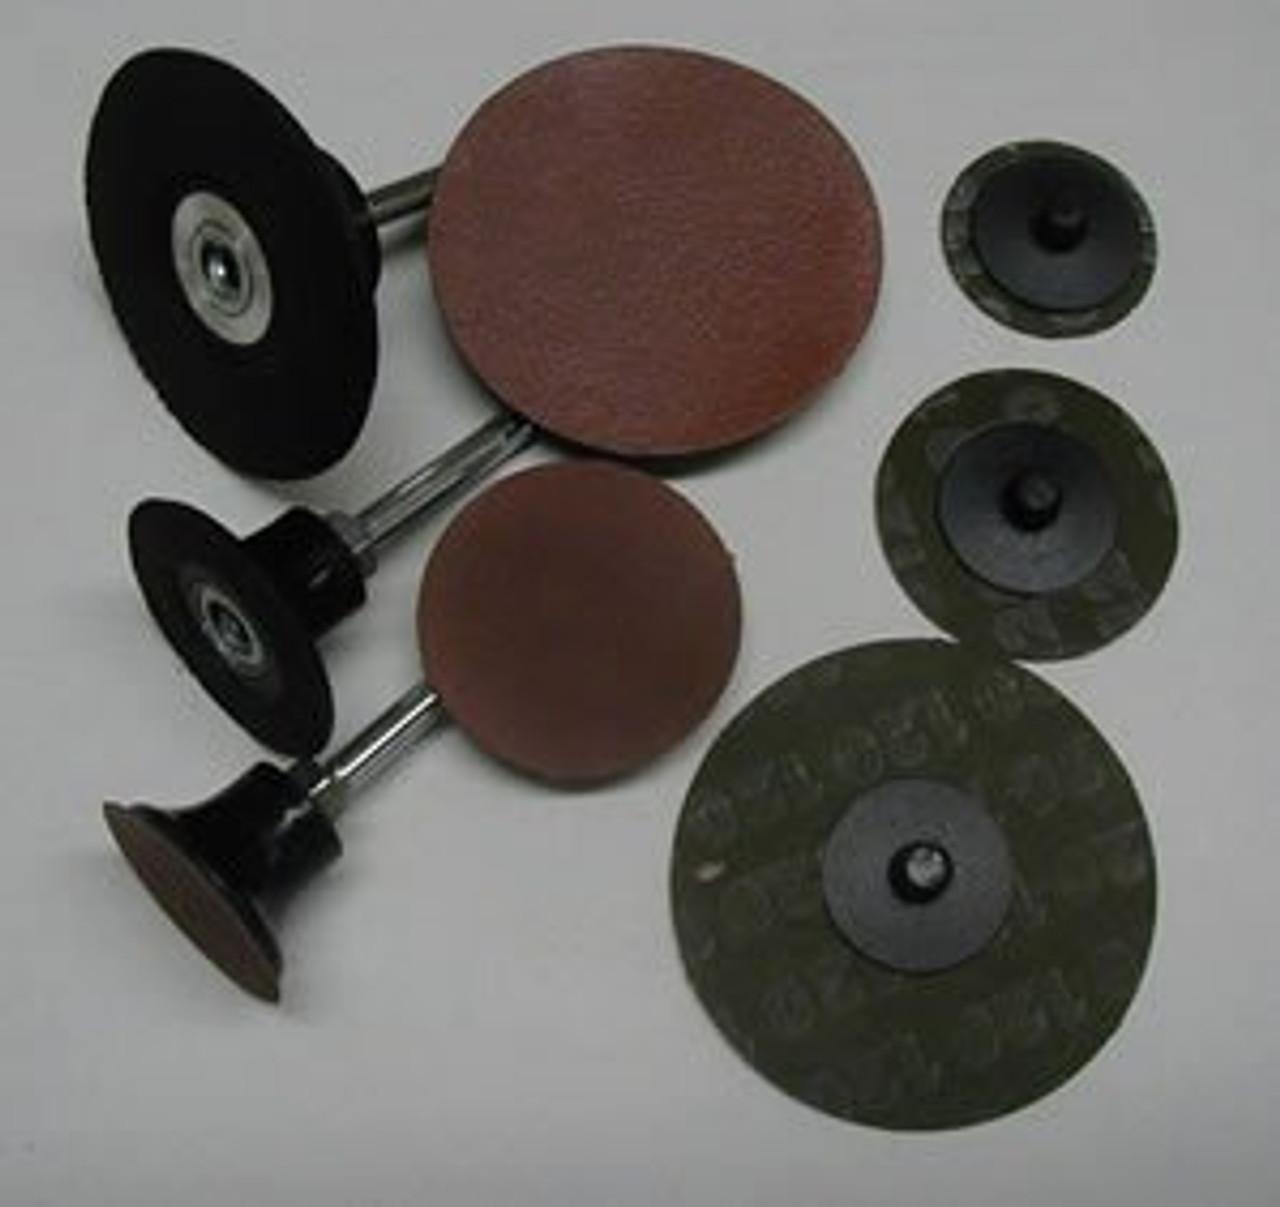 "Aluminum Oxide Sanding Disk 3"" - 24 Grit"